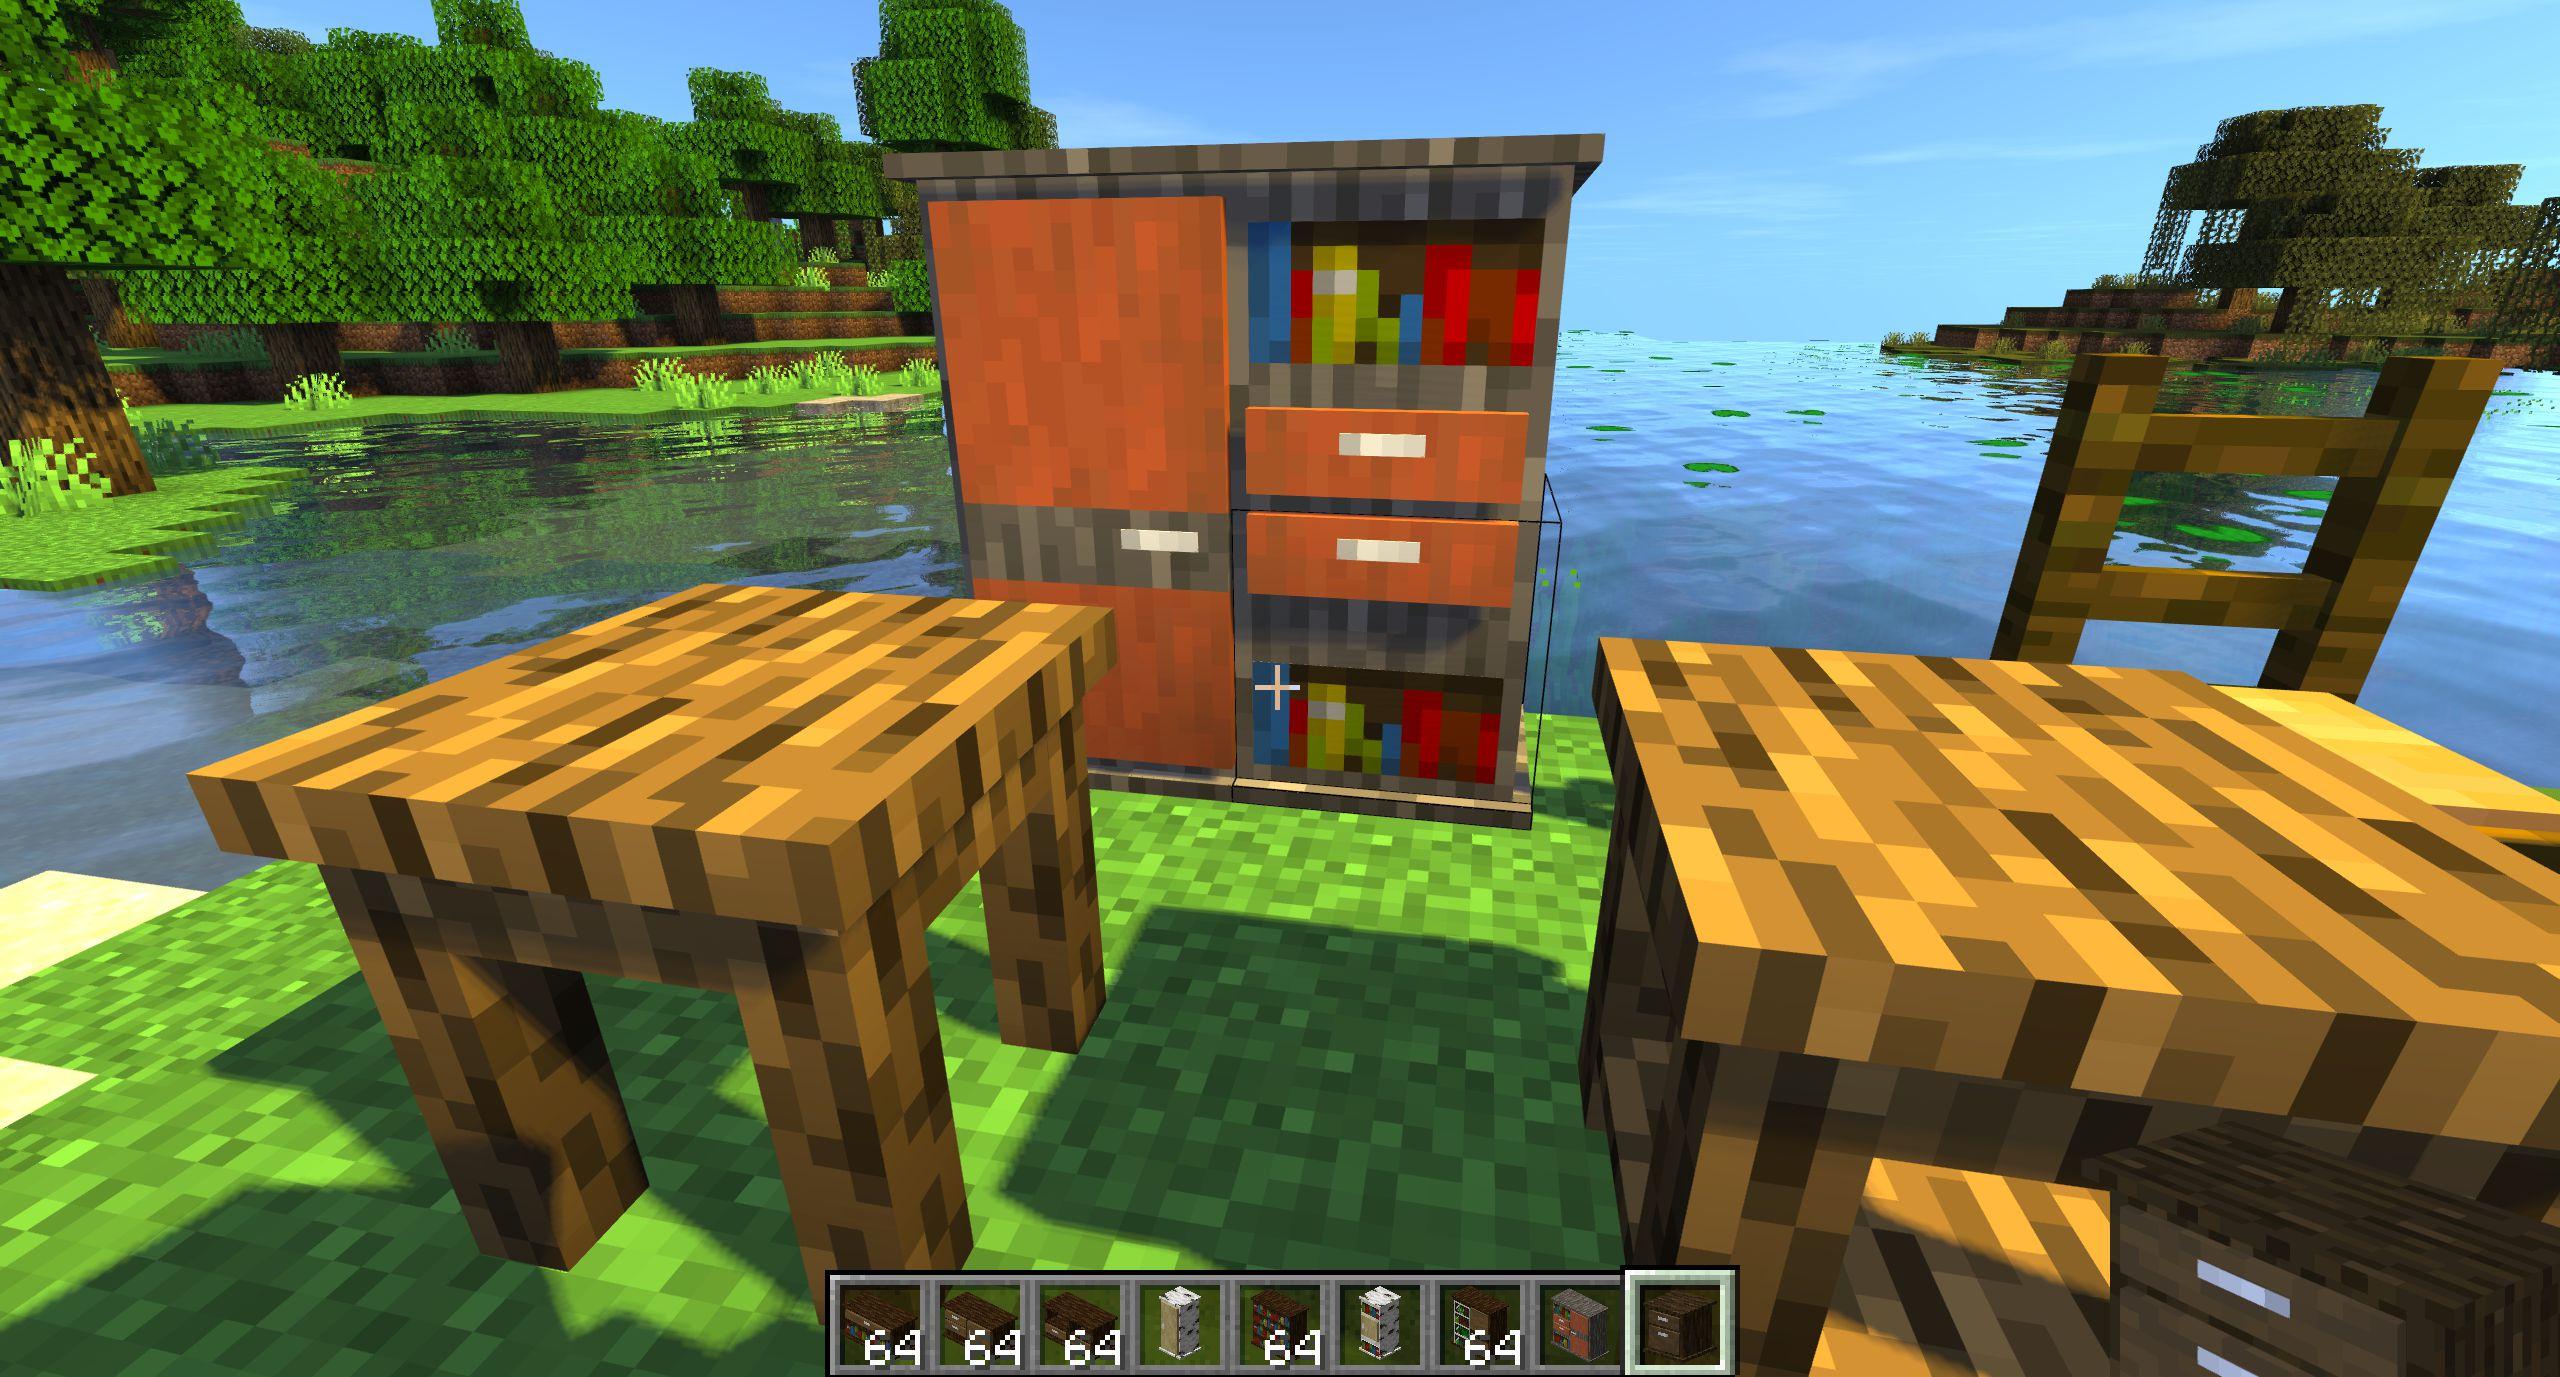 Мод на мебель «Macaw's Furniture» - скриншот 6